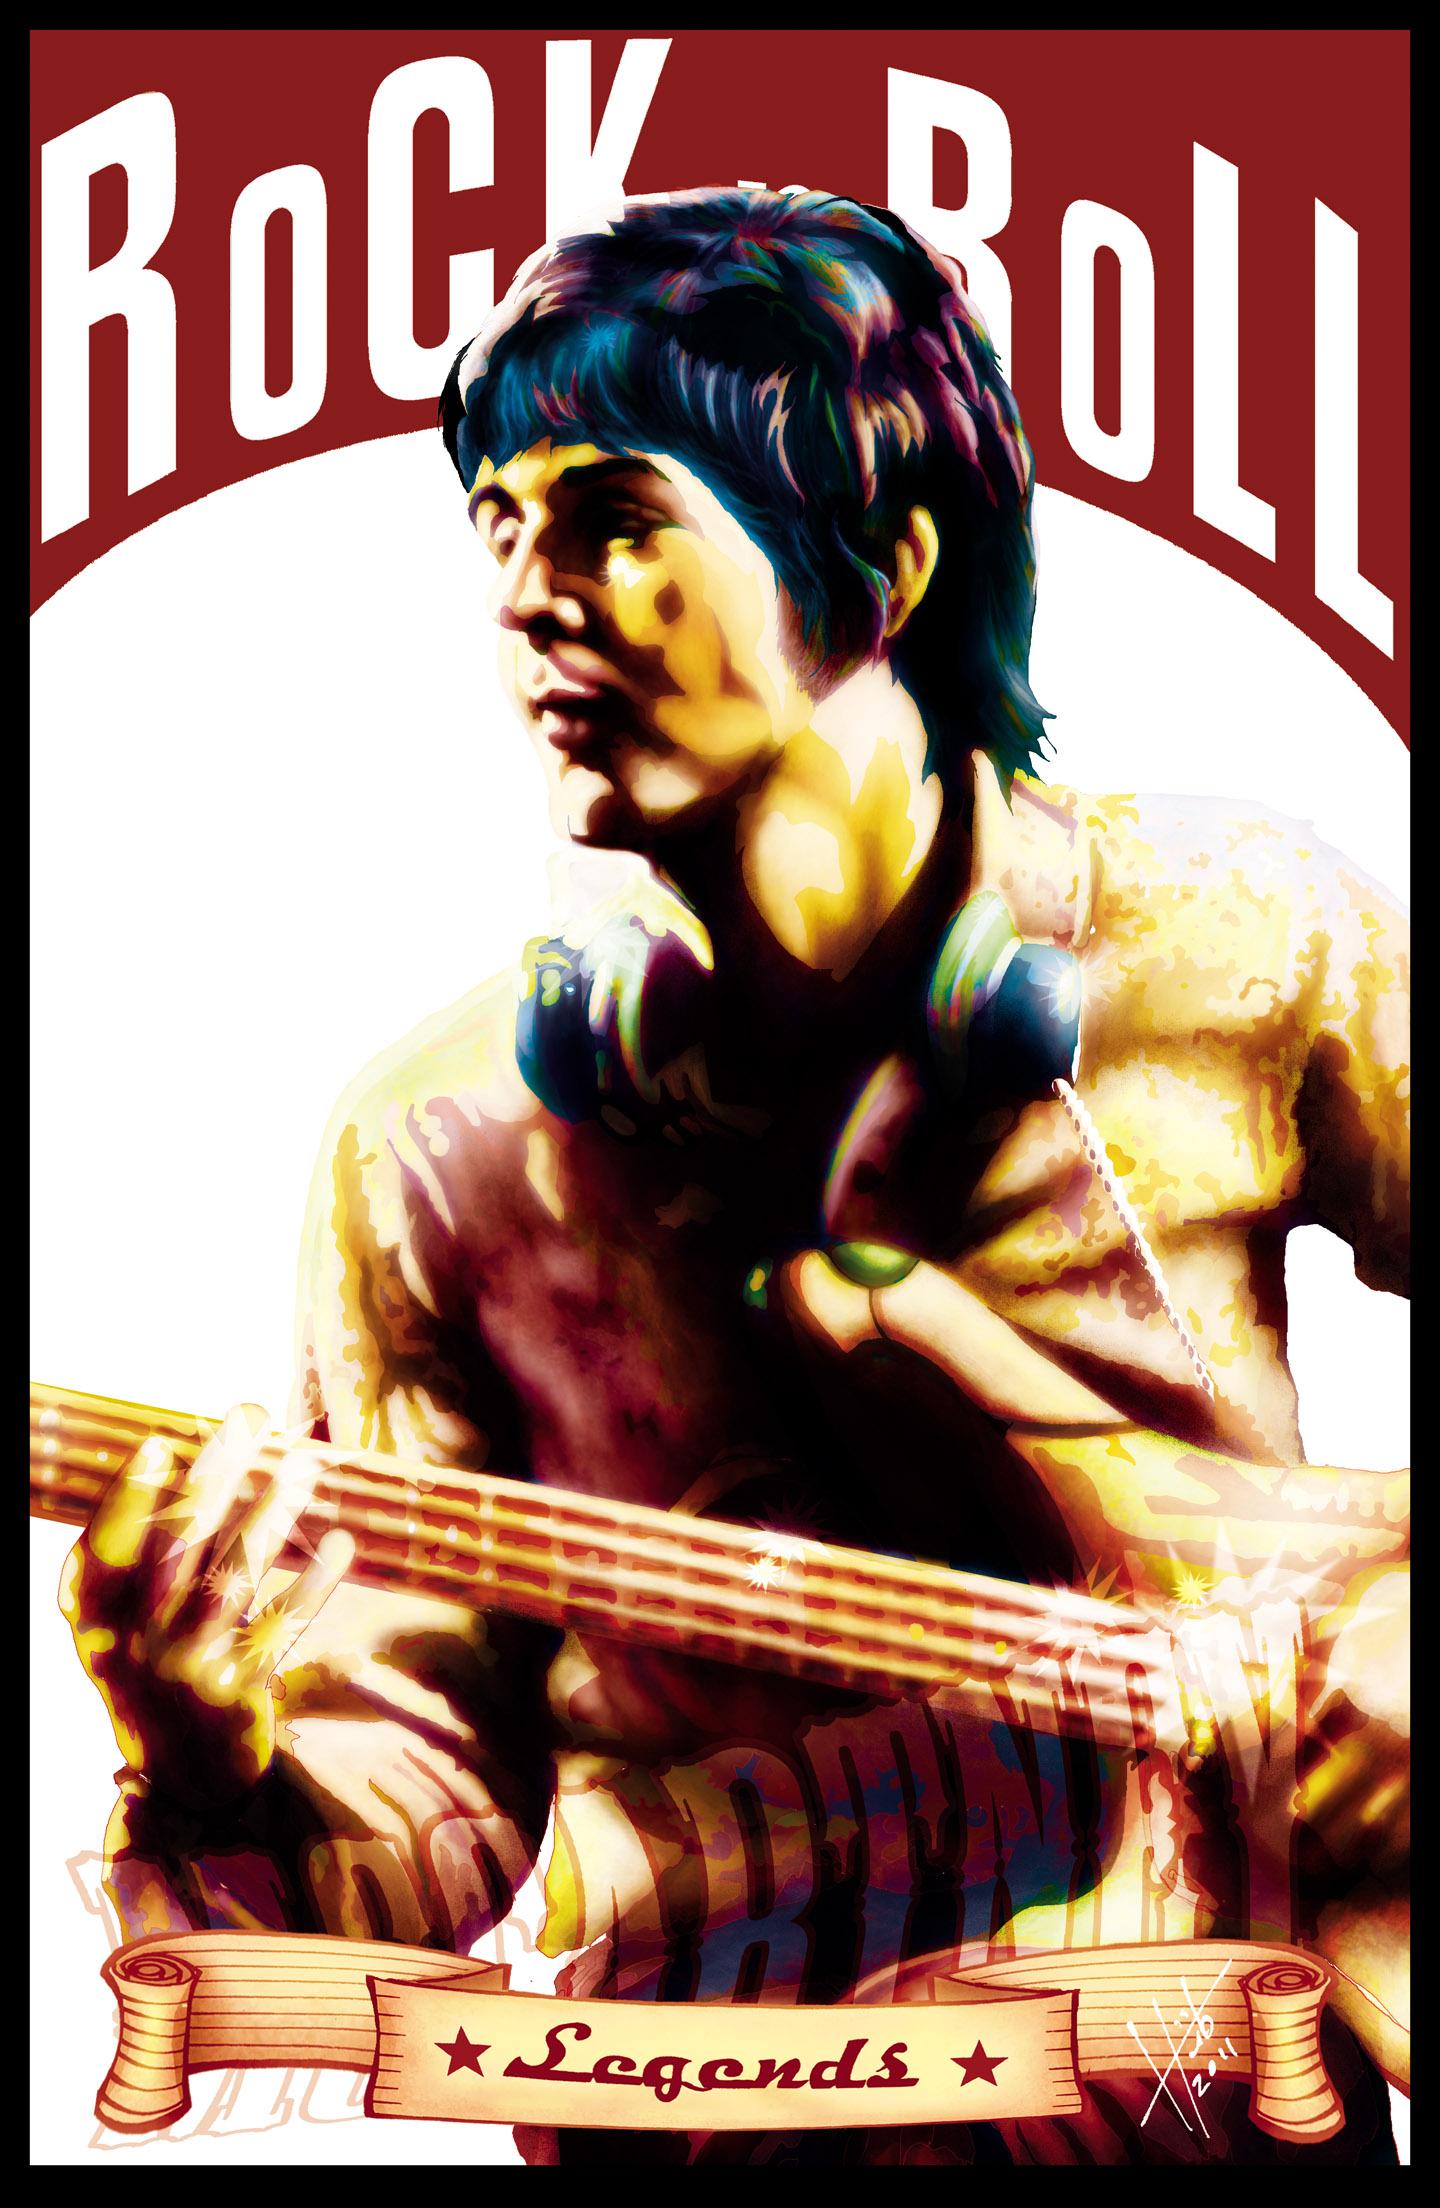 McCartney by RRLegends